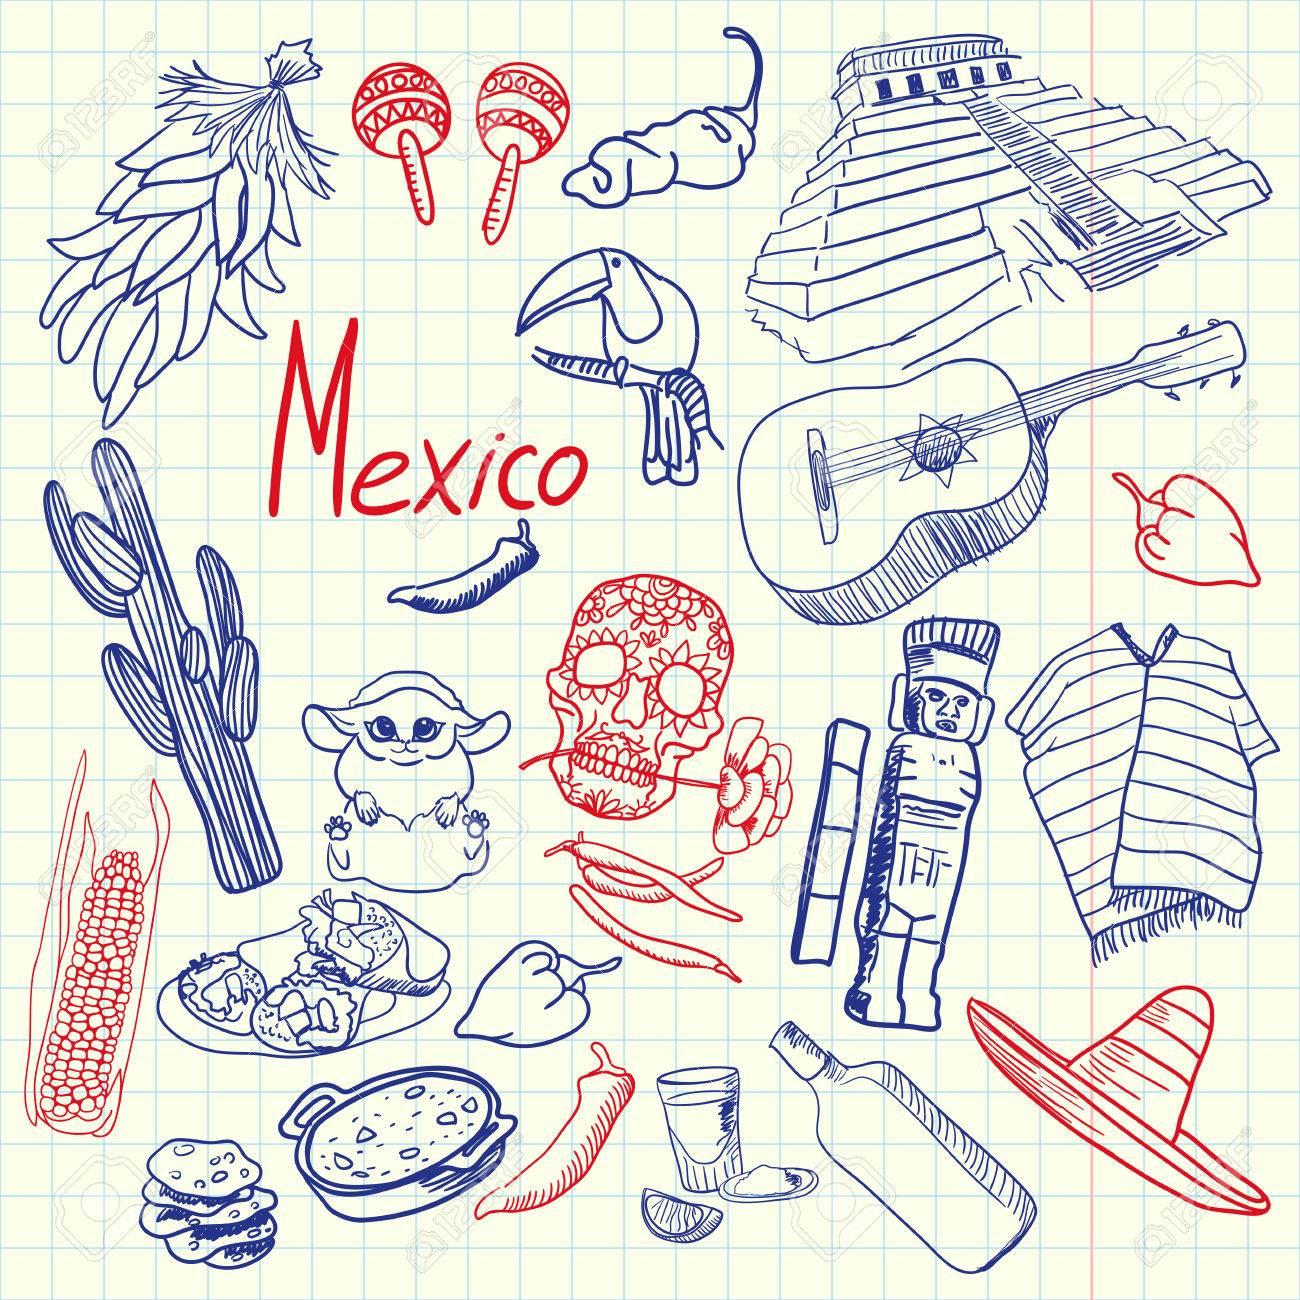 1300x1300 Mexico Associated Symbols. Mexican National, Cultural, Culinary